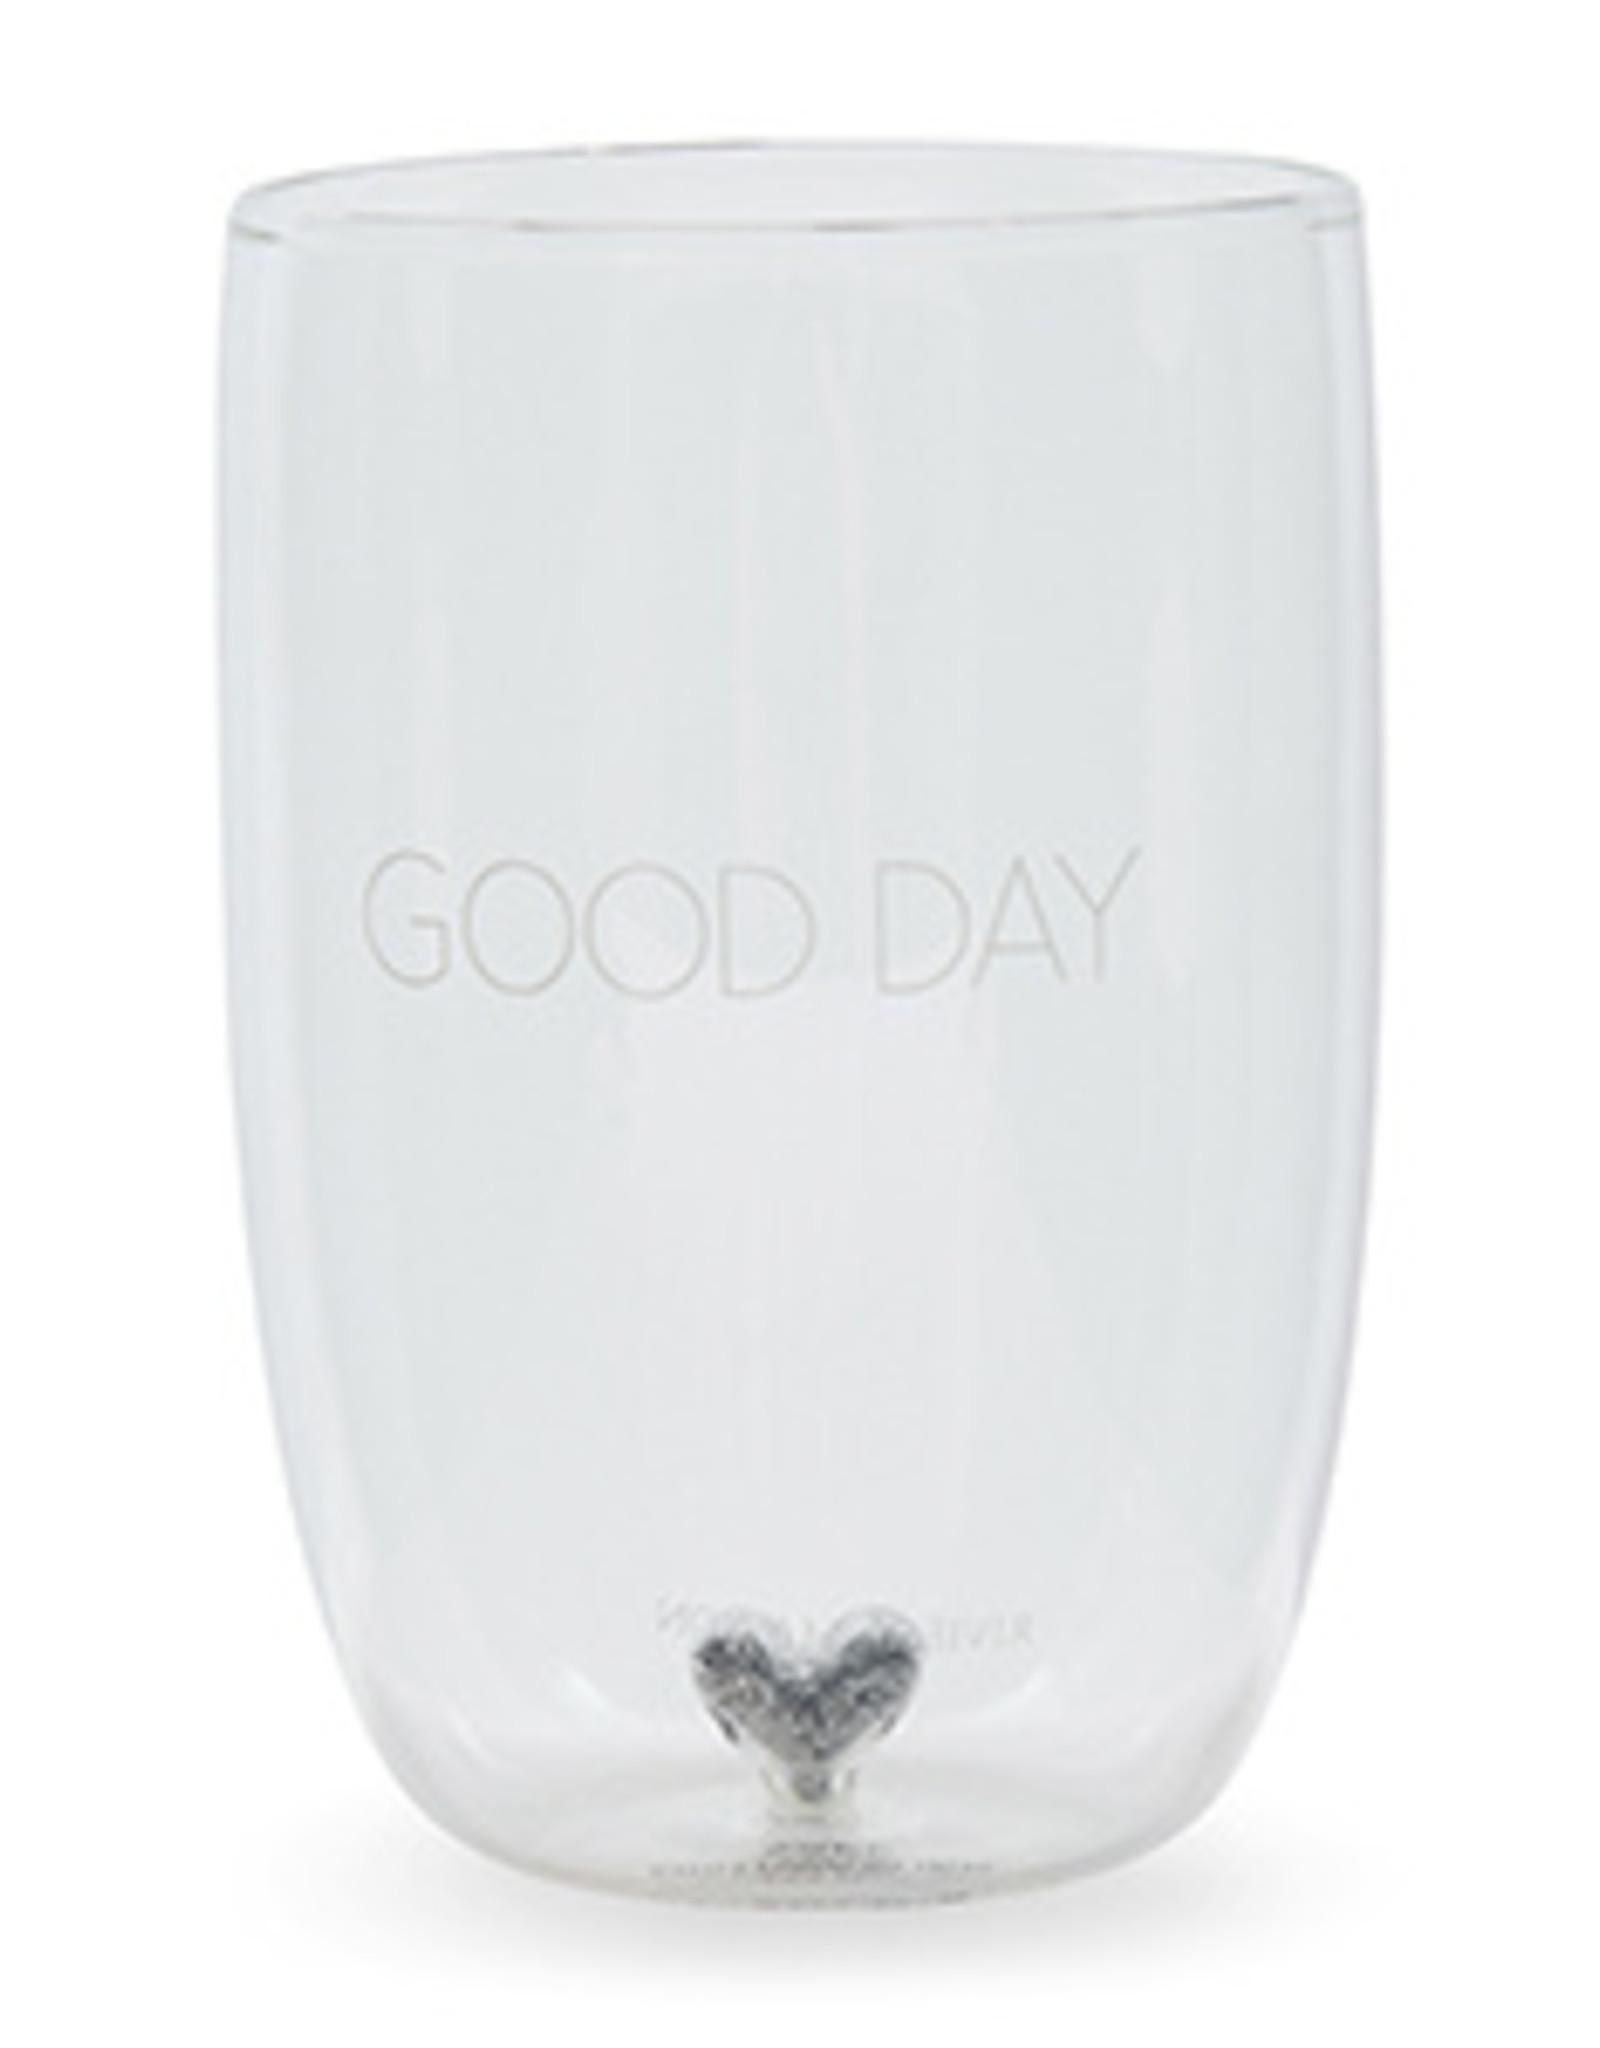 Riviera Maison Good Day Glass L